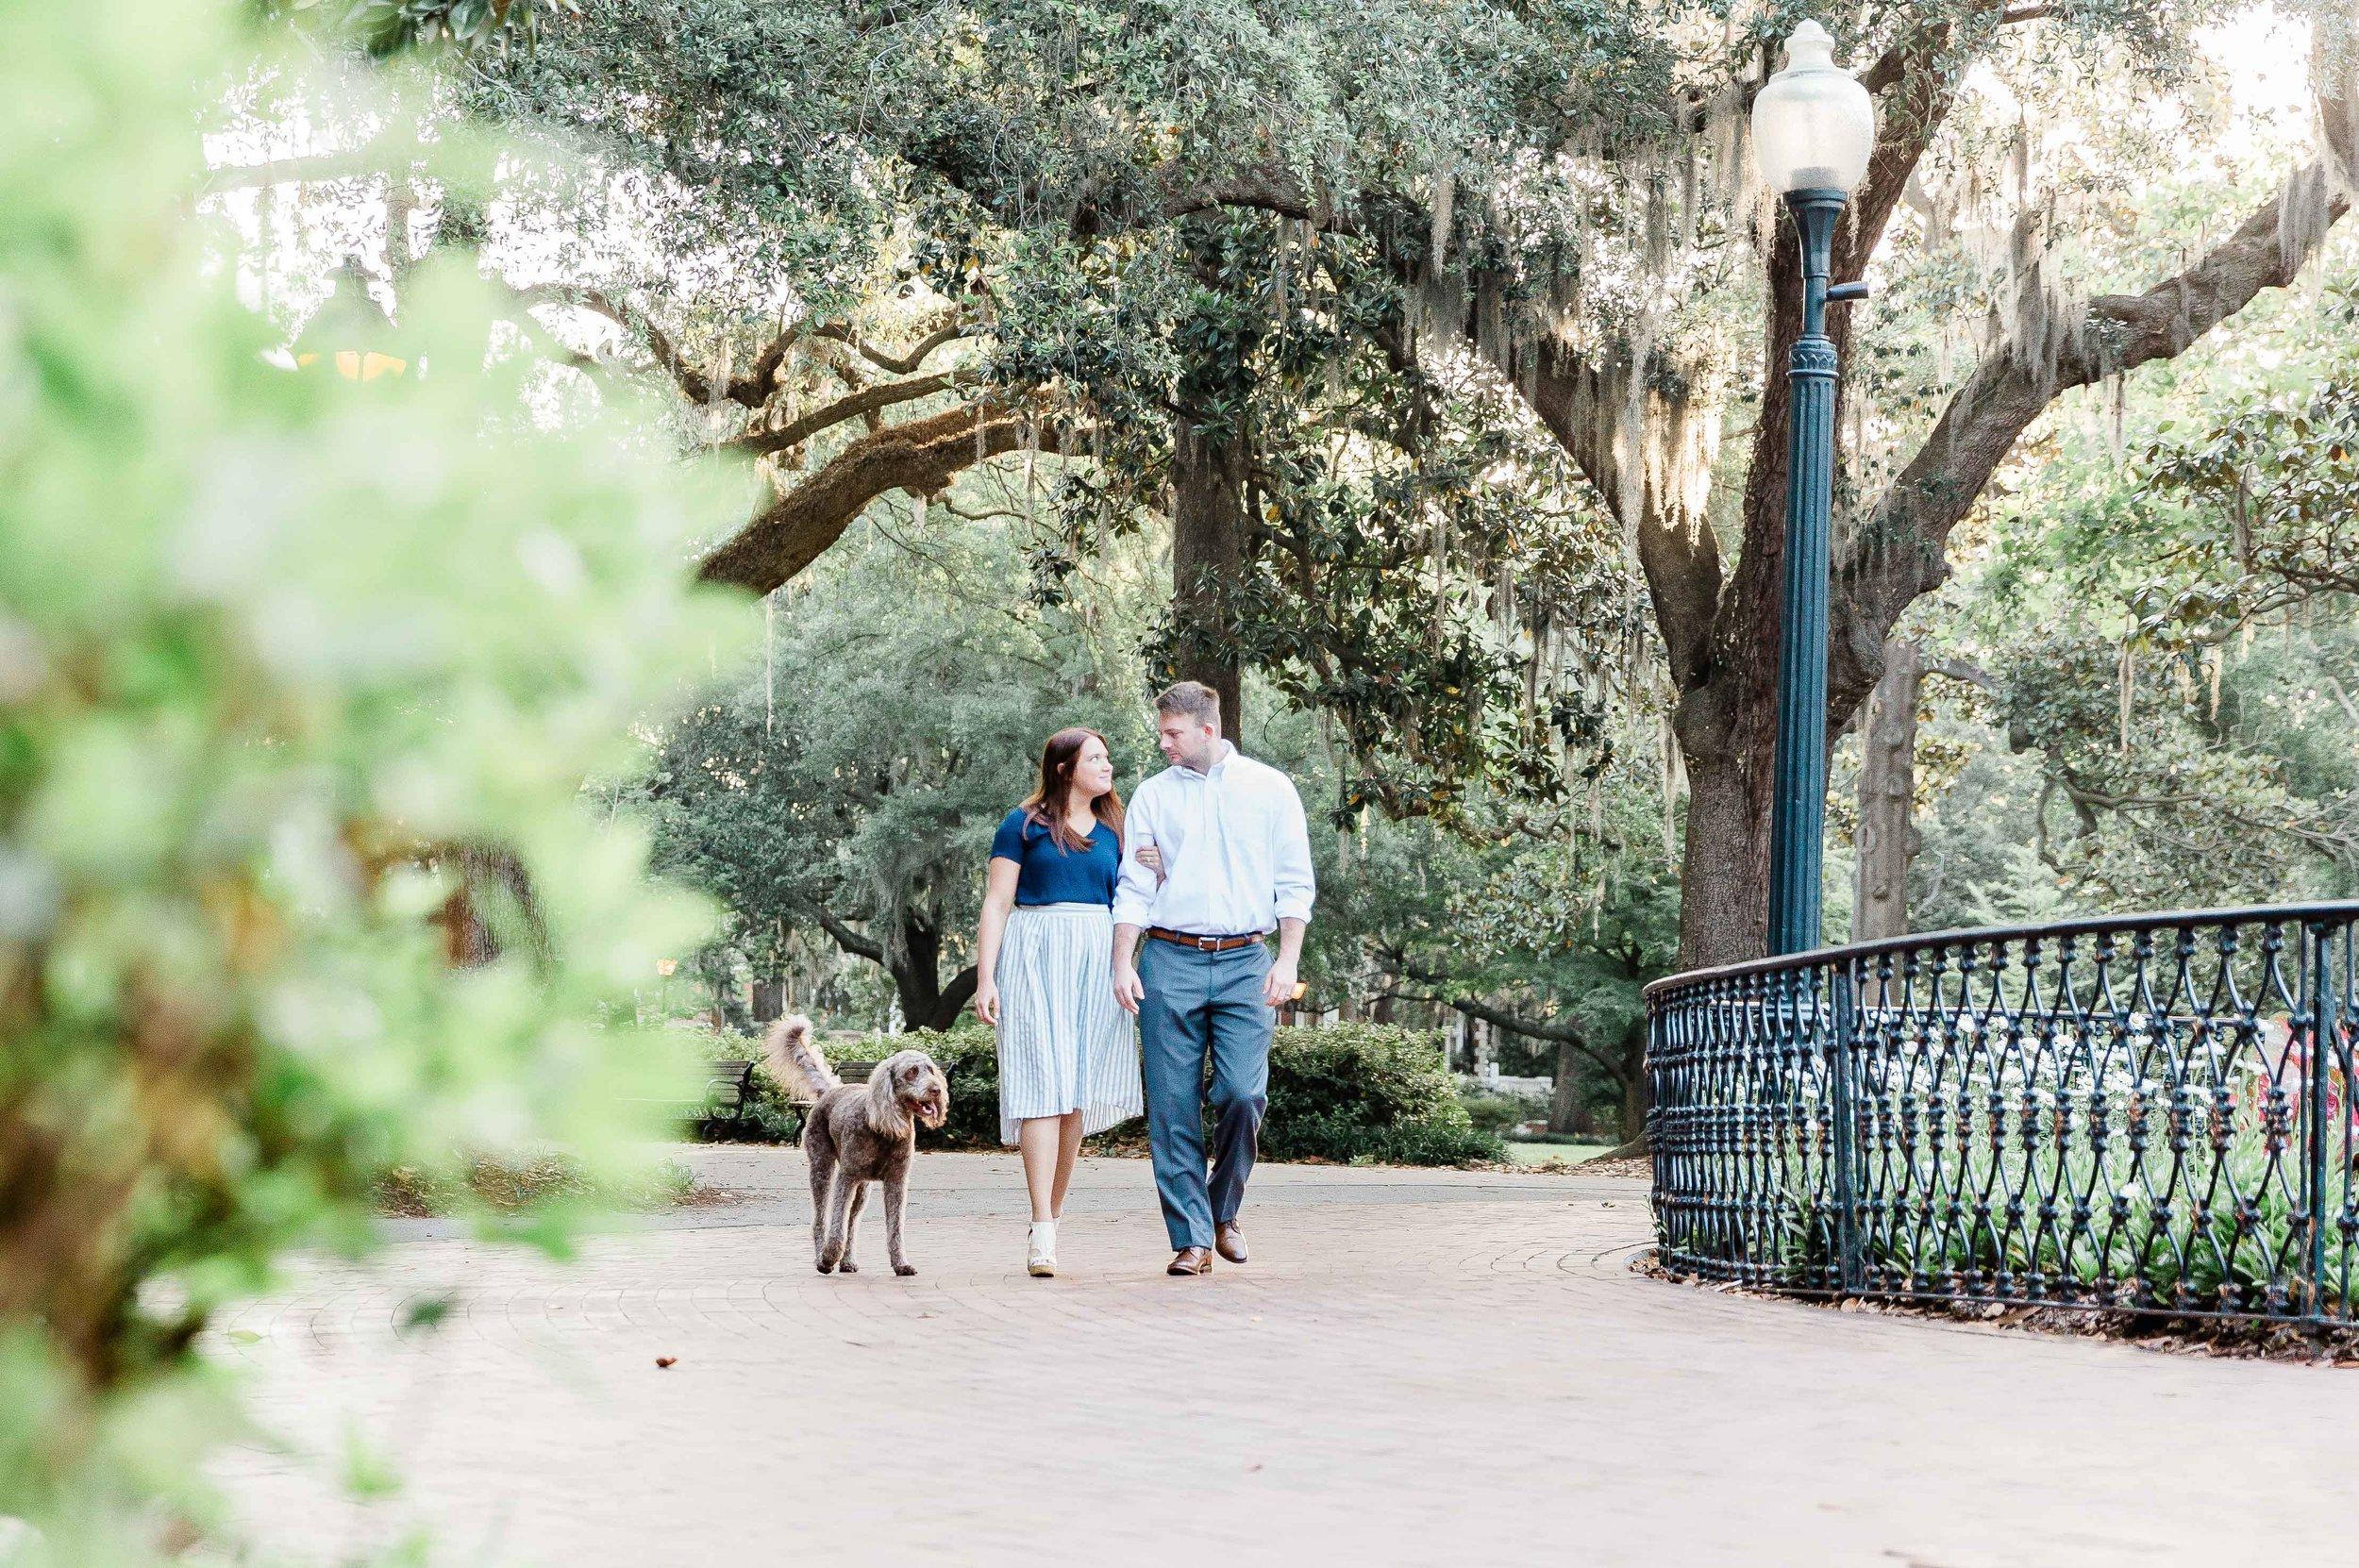 20190519Georgia-Savannah-Kristen & Zach-Forsyth Park-Lafayette Square03.jpg